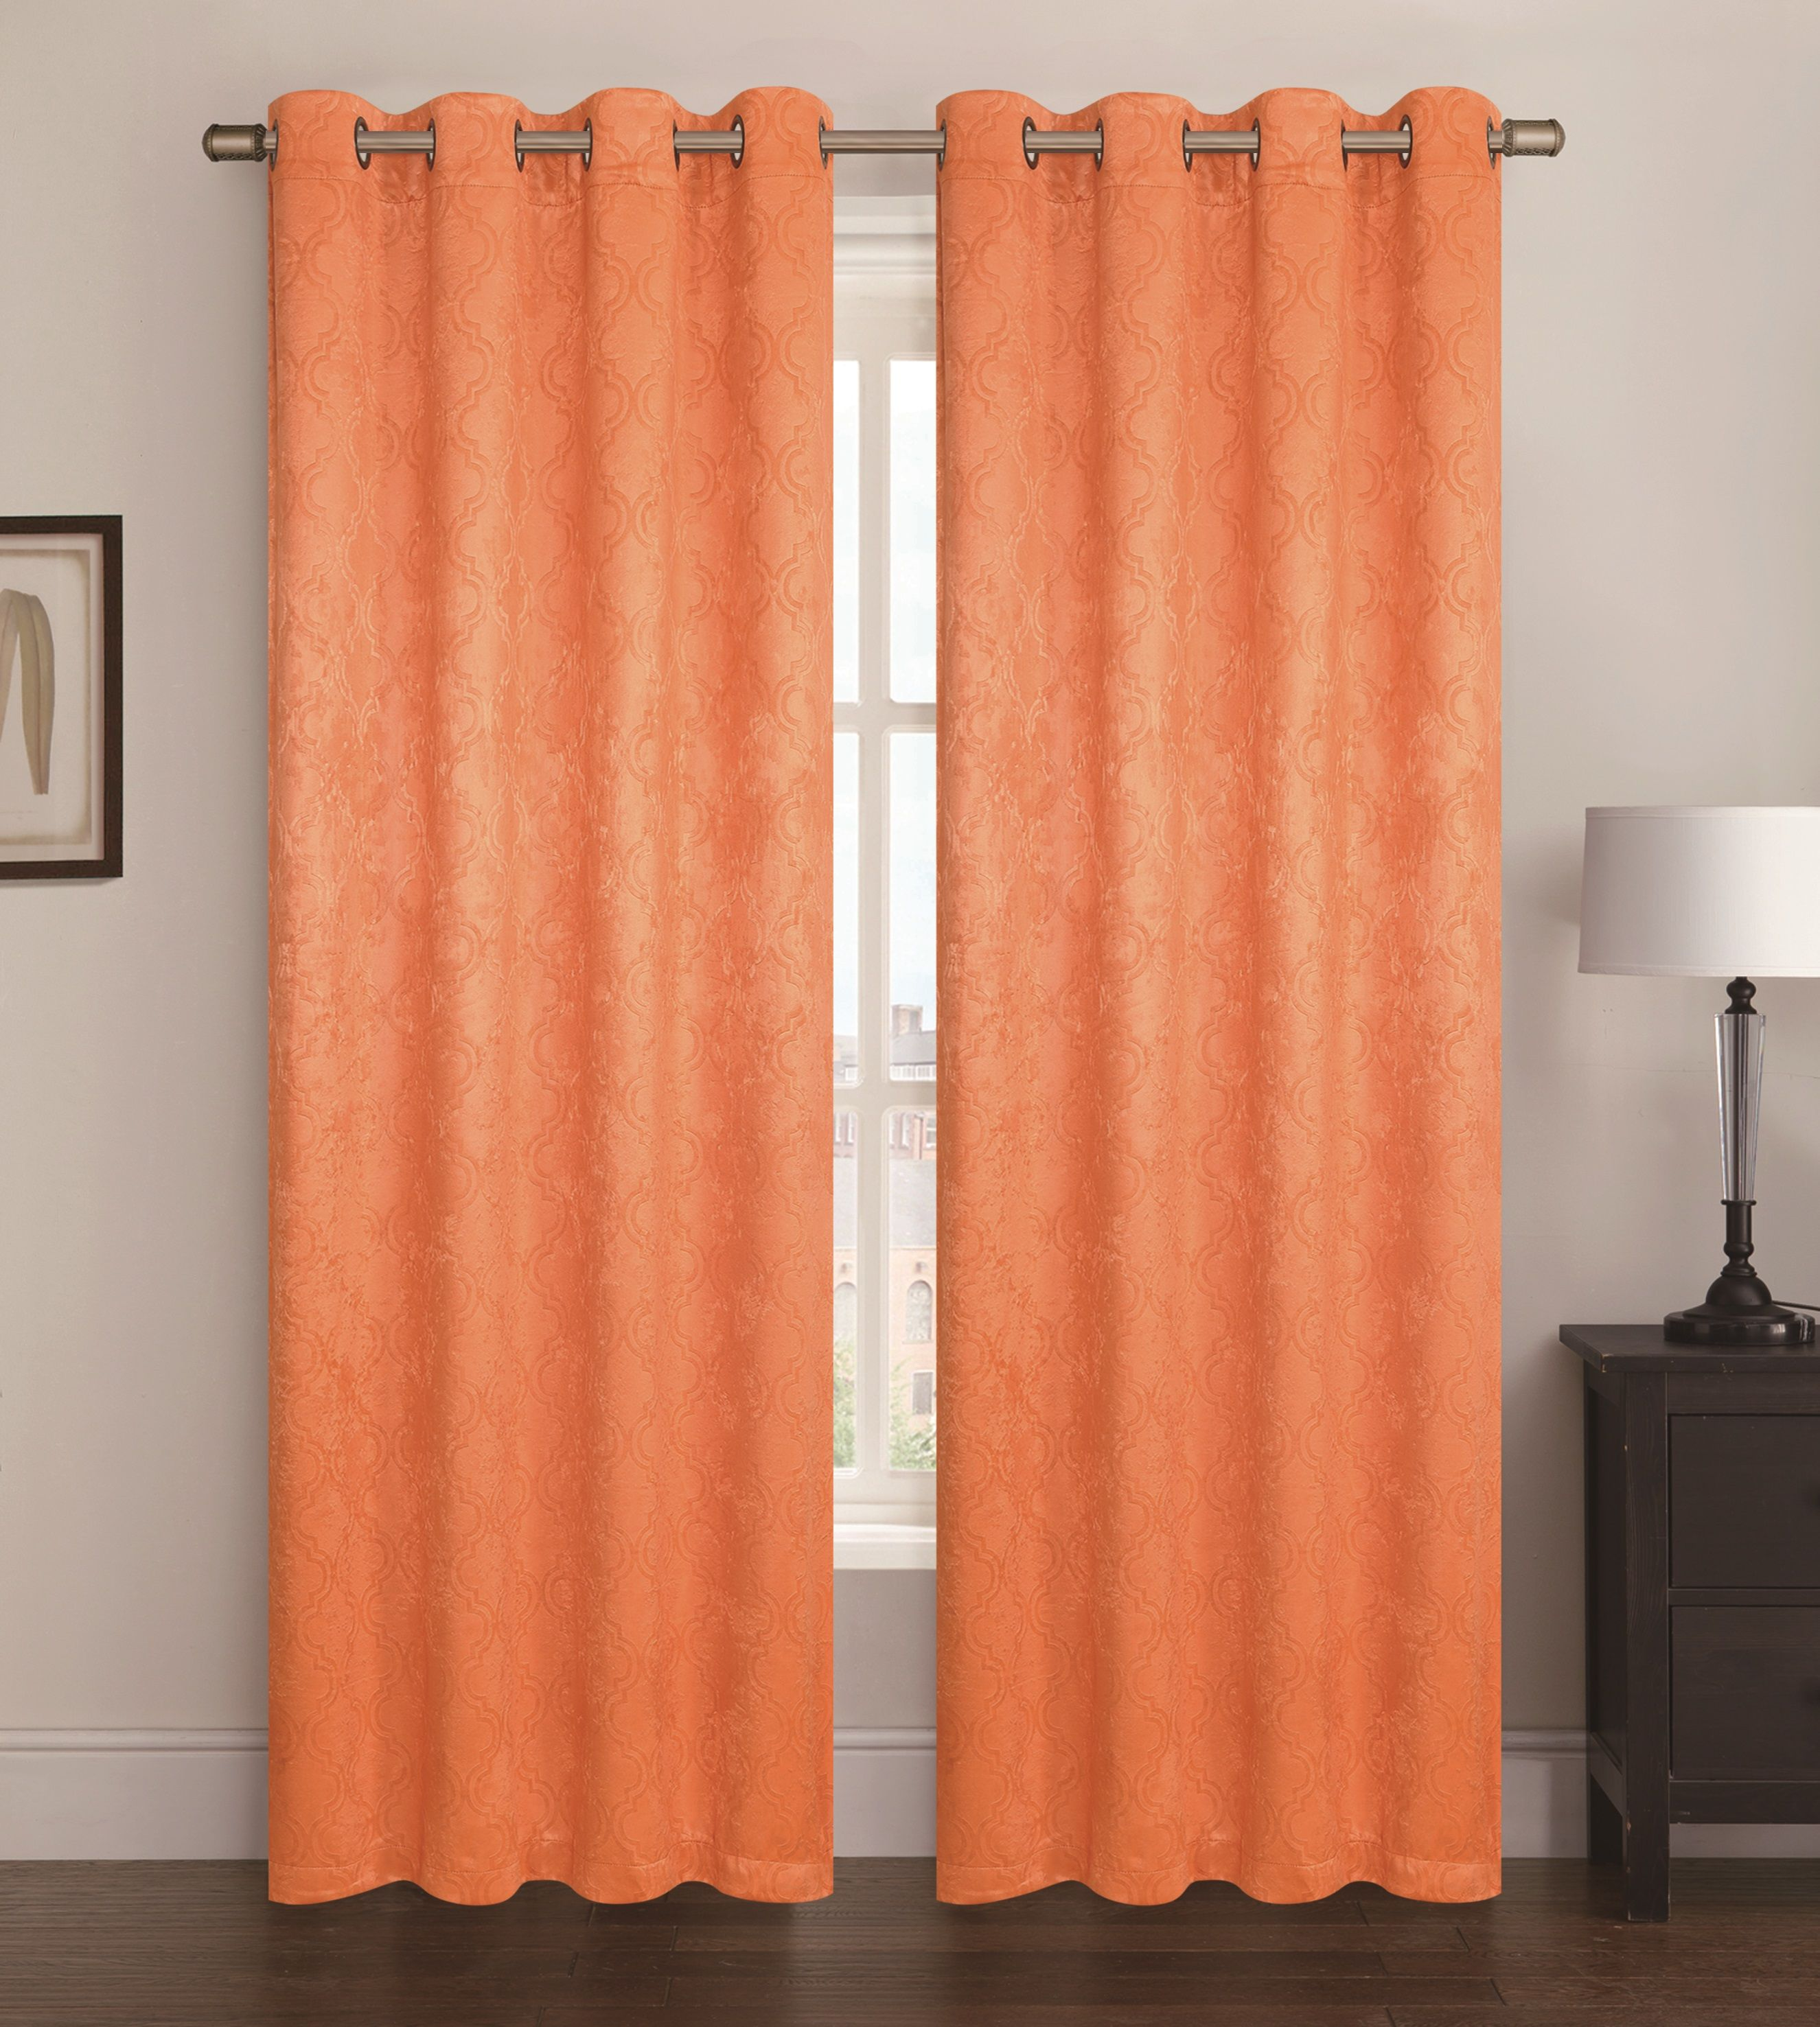 Window dressing ideas for arched windows  blackout  room darkening window curtain panel jacquard geometric